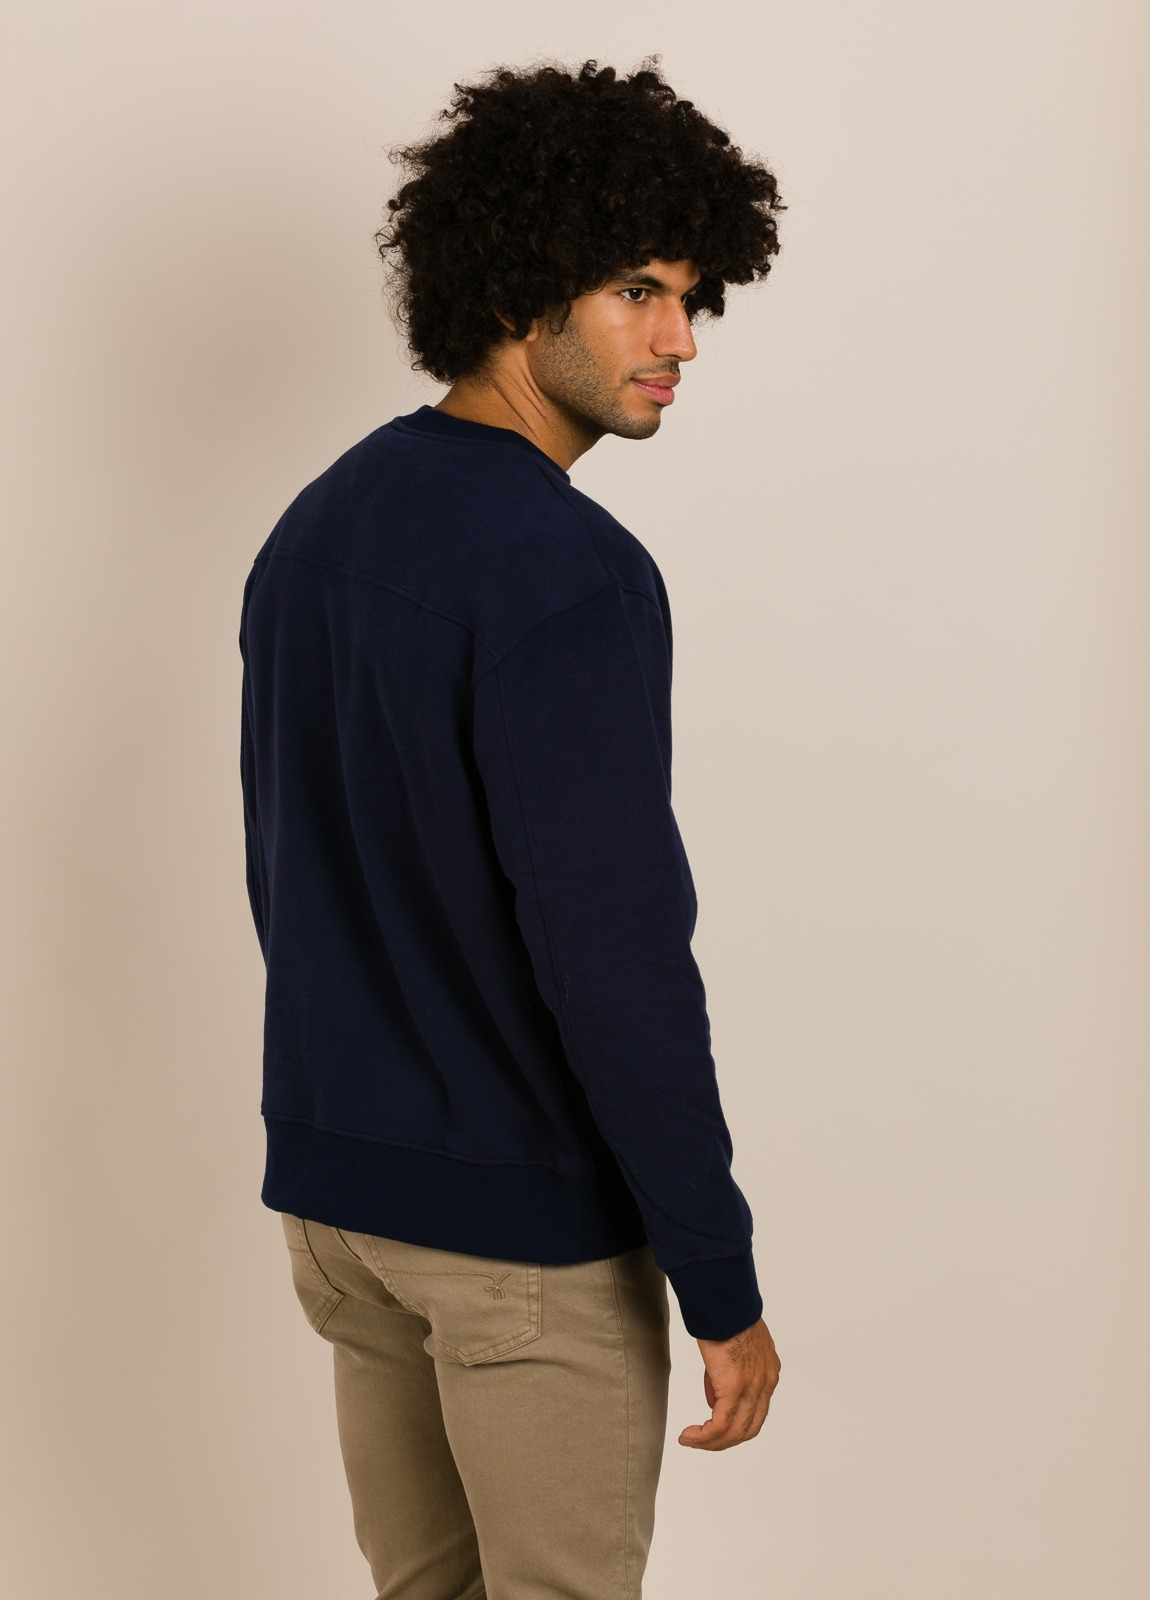 Sudadera ECOALF azul marino con texto estampado - Ítem1